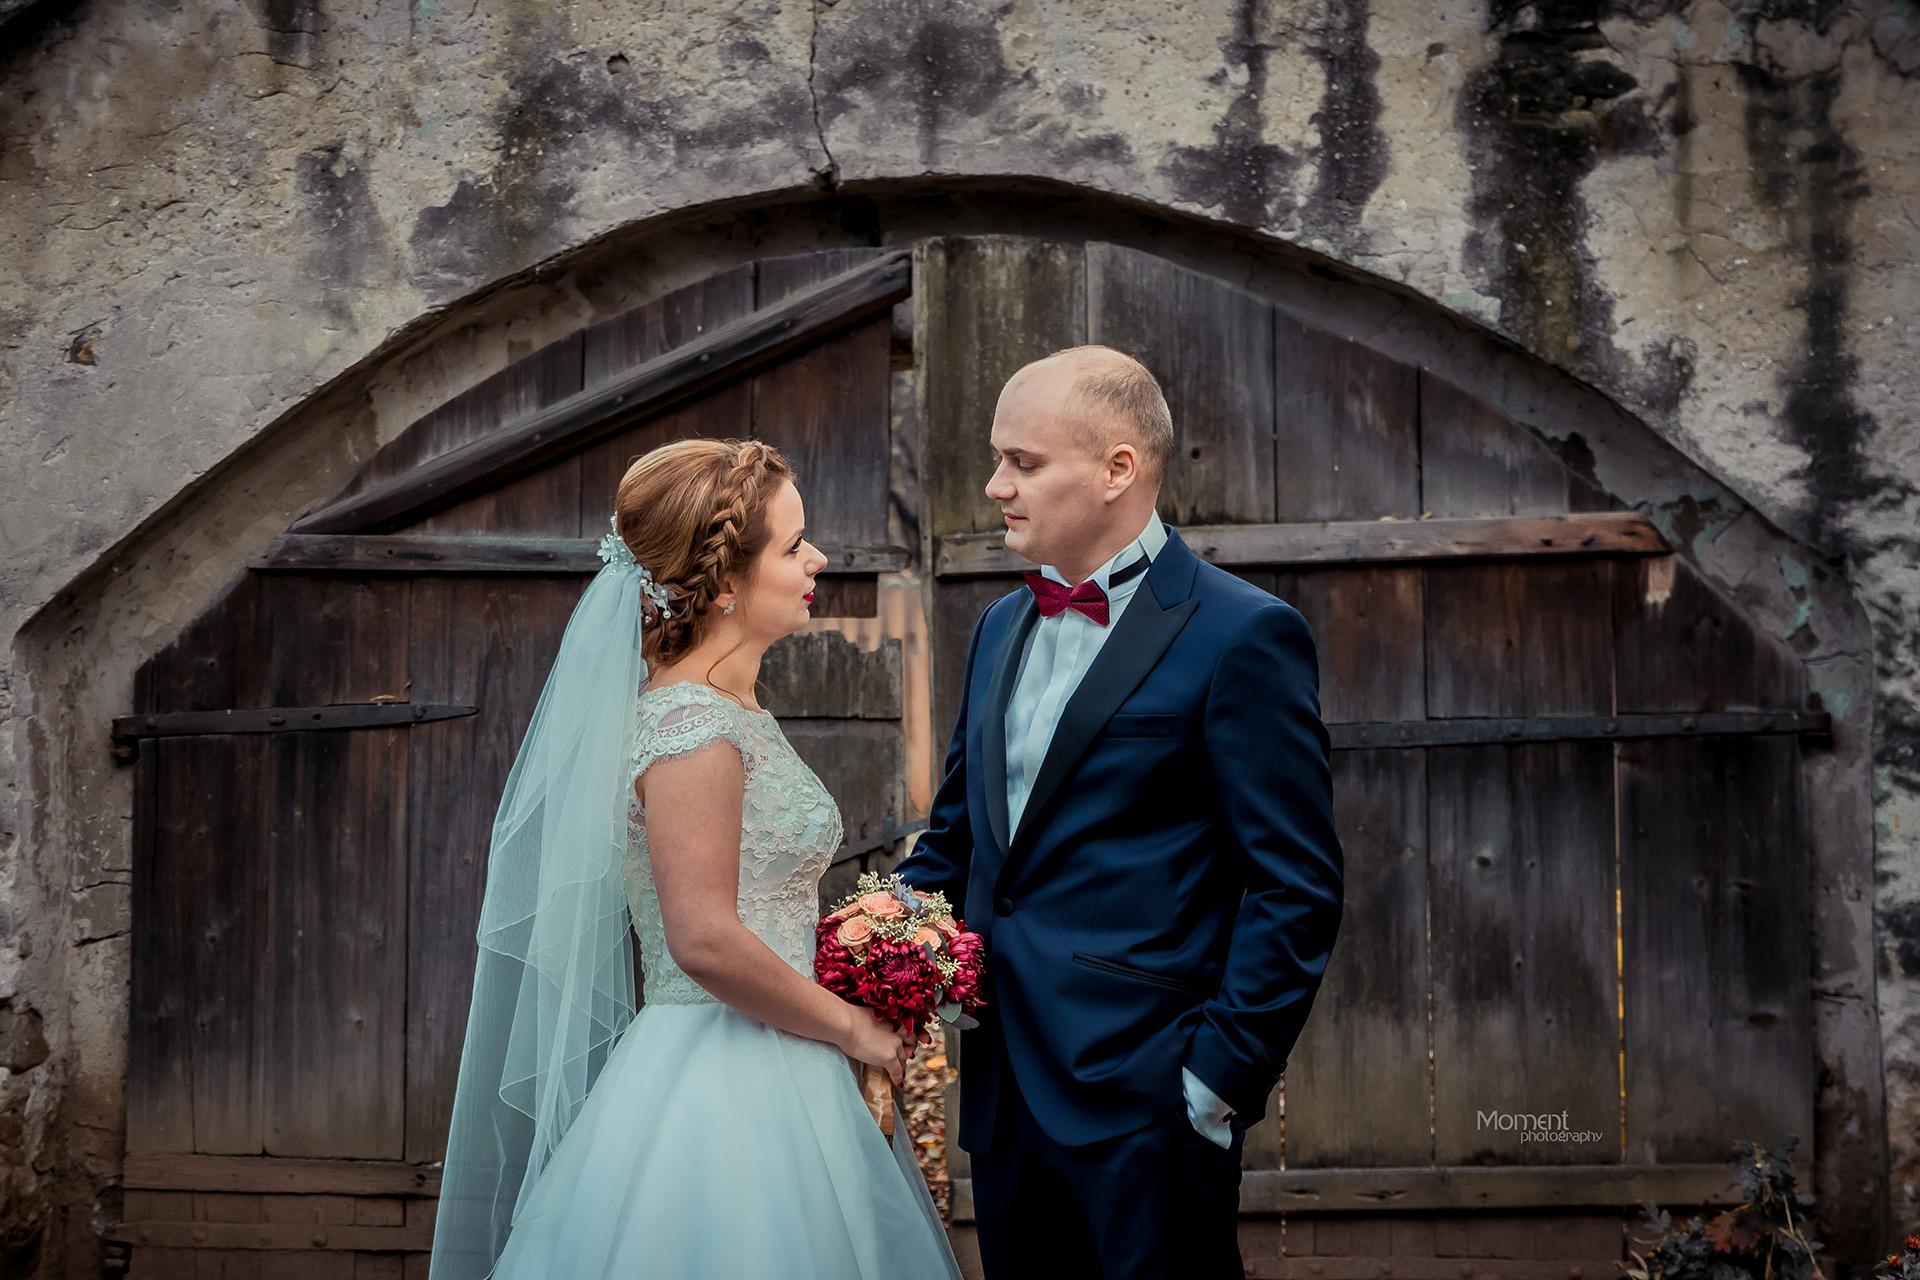 Adrian & Irina - Wedding